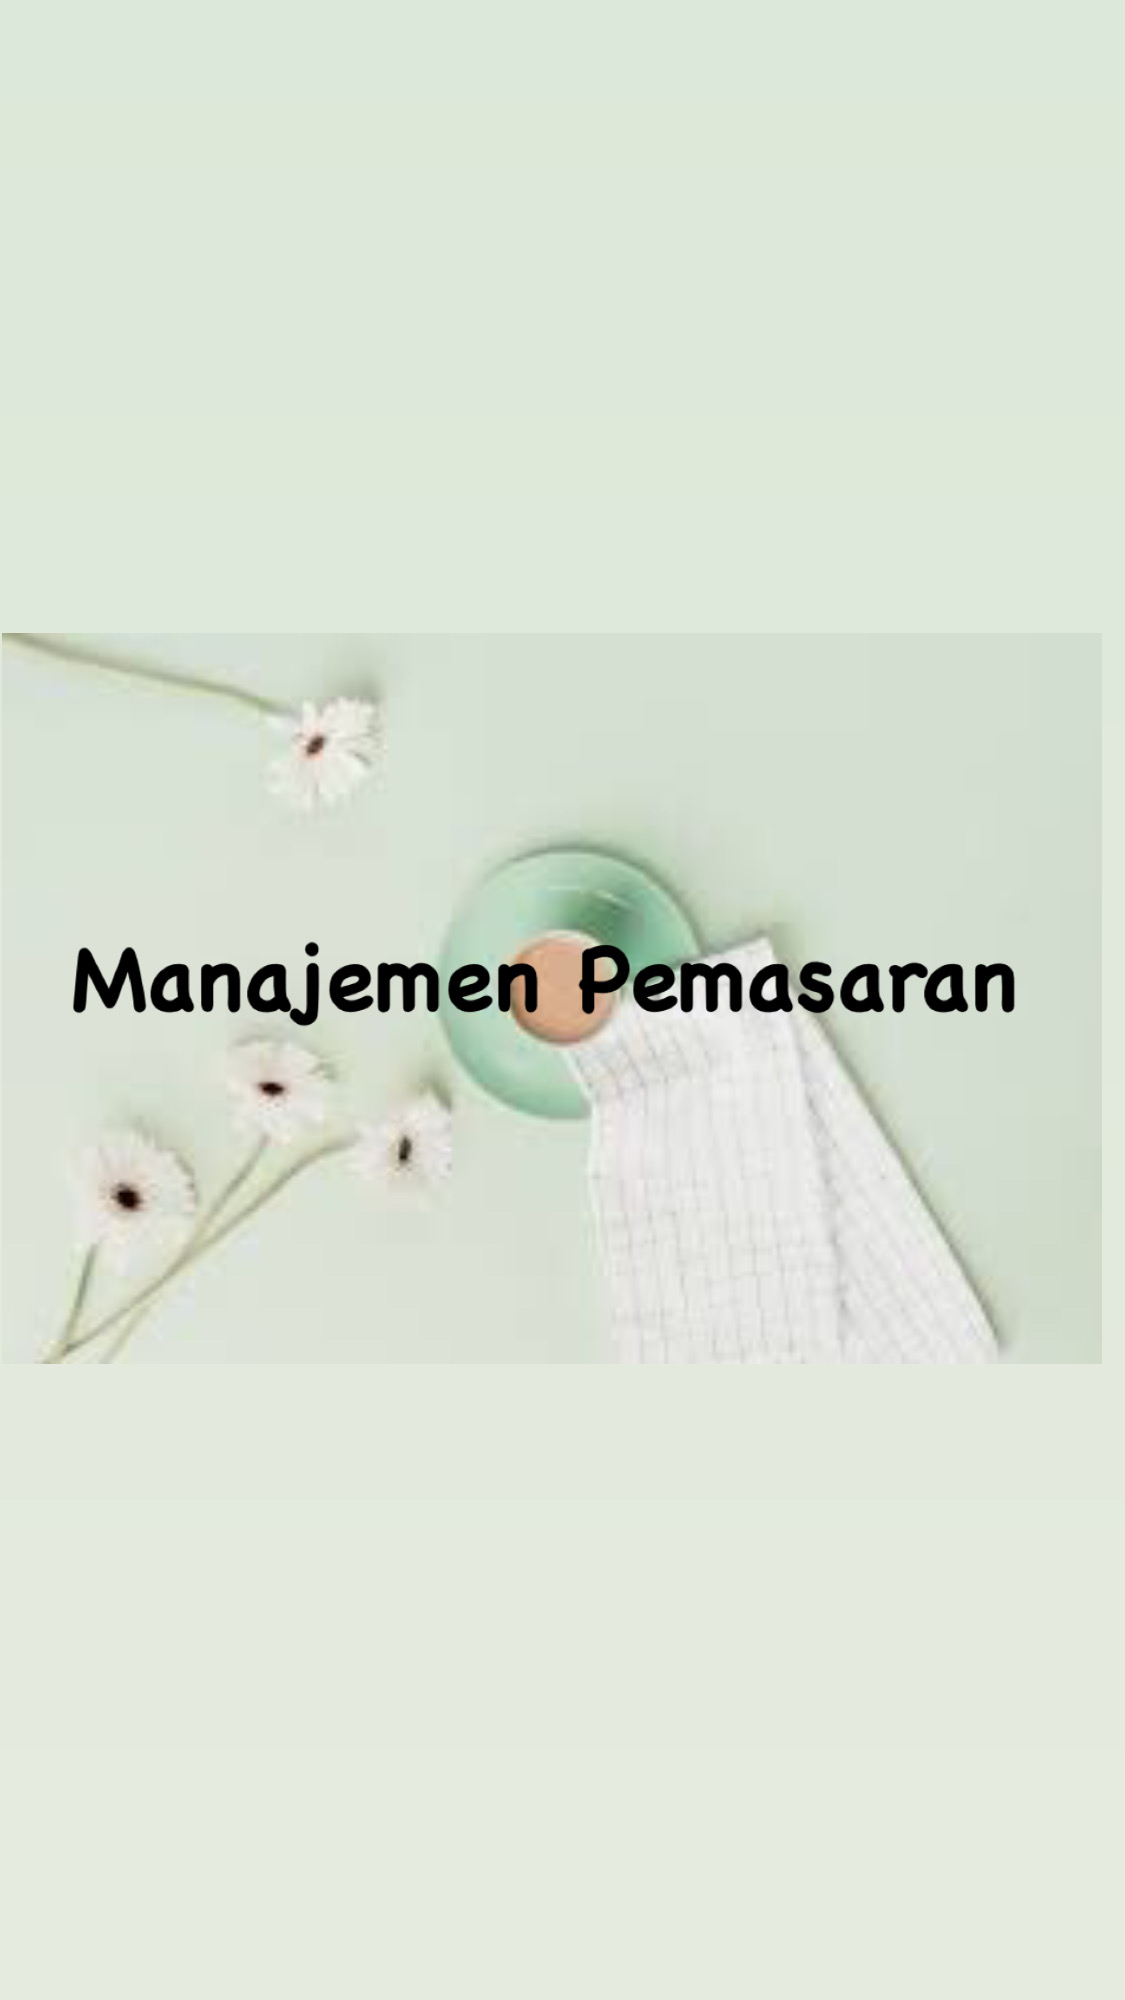 Manajemen Pemasaran_S_SMT 5_20211